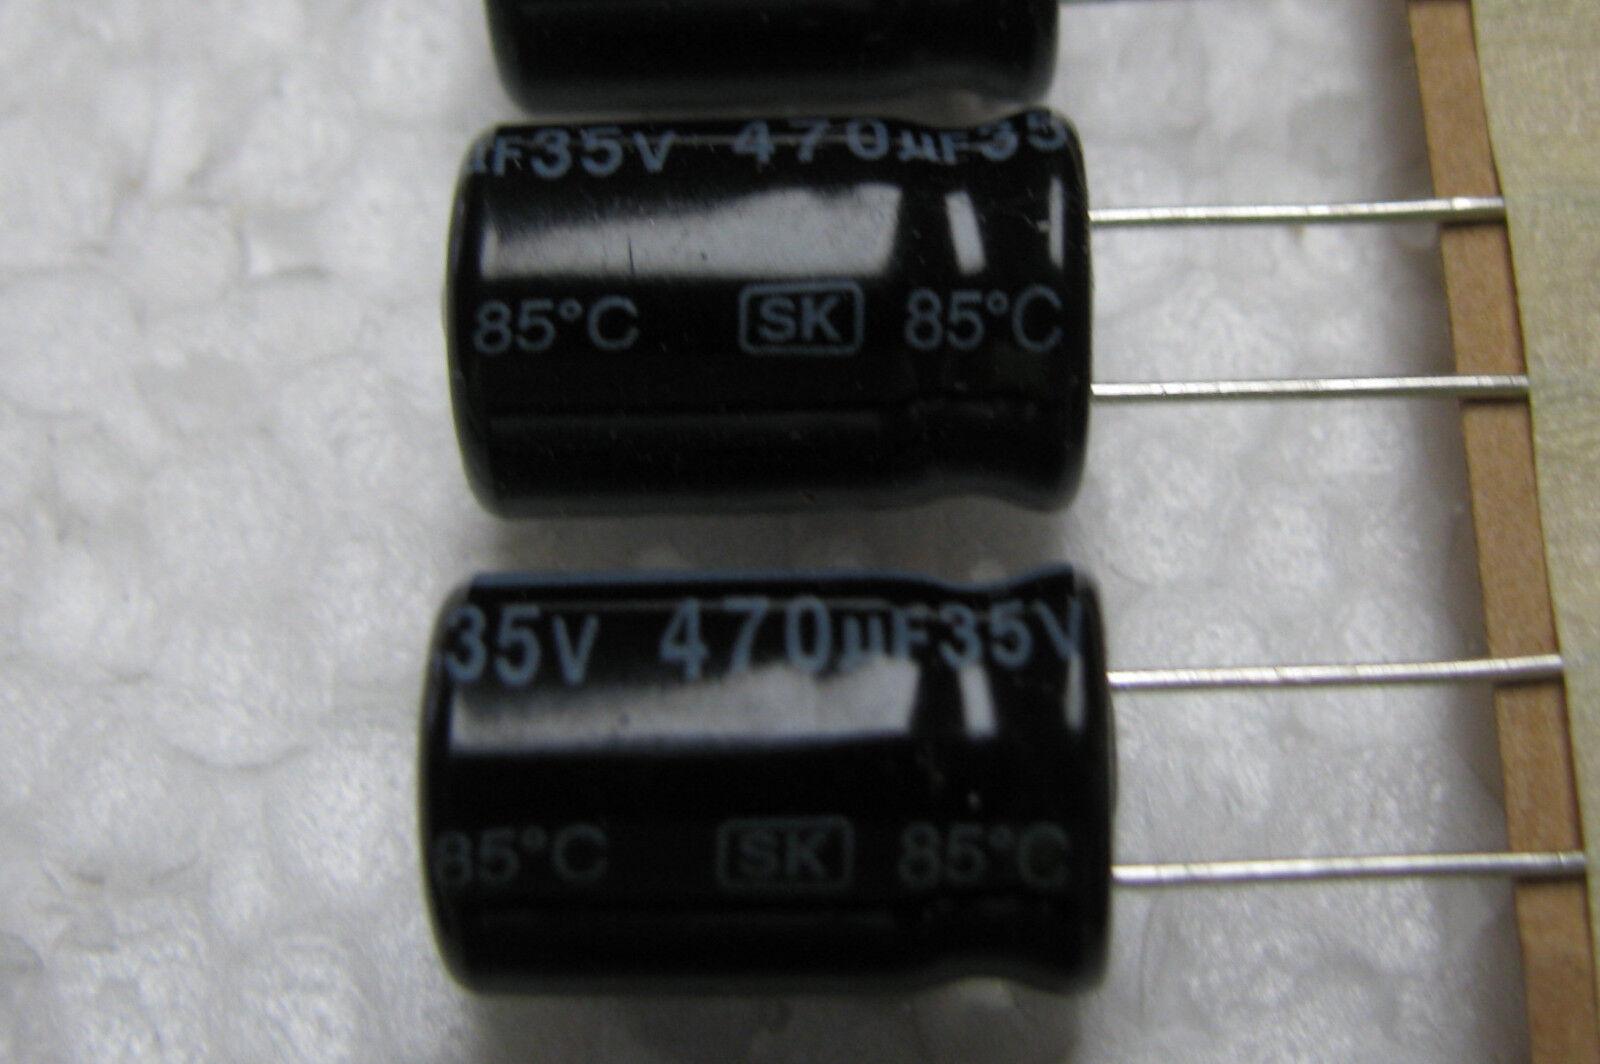 4x 500uF 75V Axial Electrolytic Aluminum Capacitor mfd DC 75VDC 500mfd 85C WBR